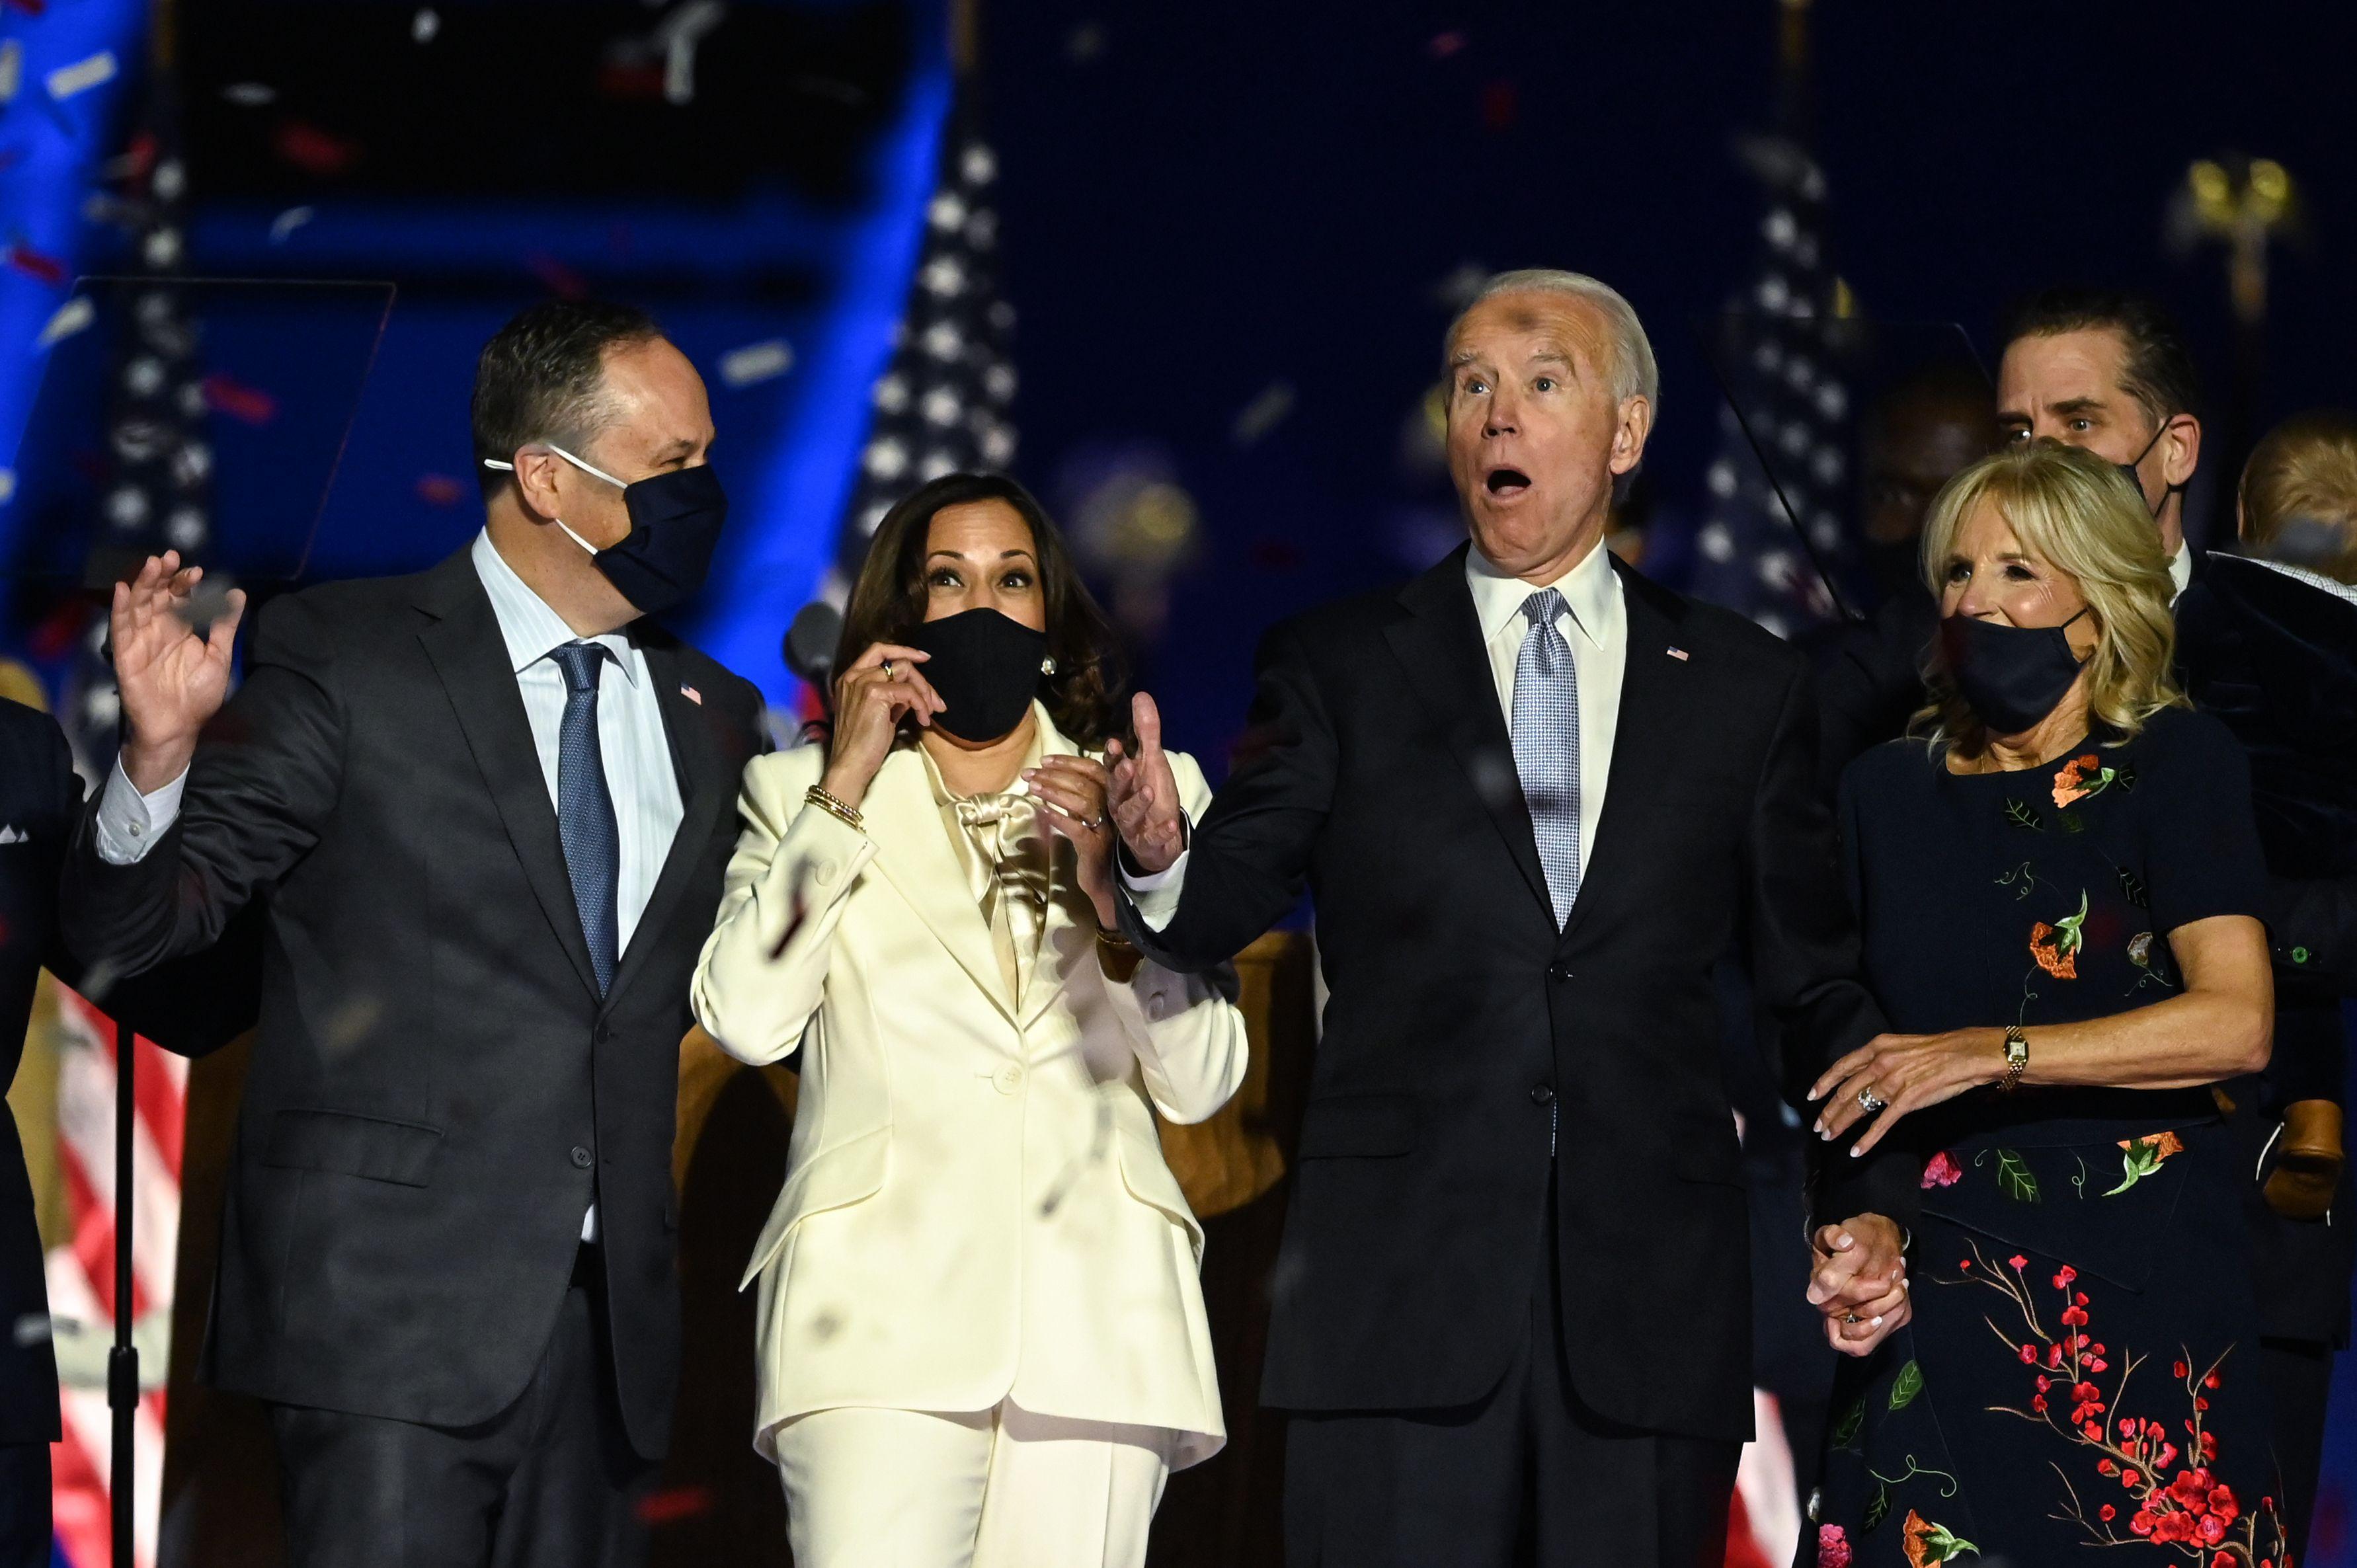 Joe Biden and Kamala Harris speeches